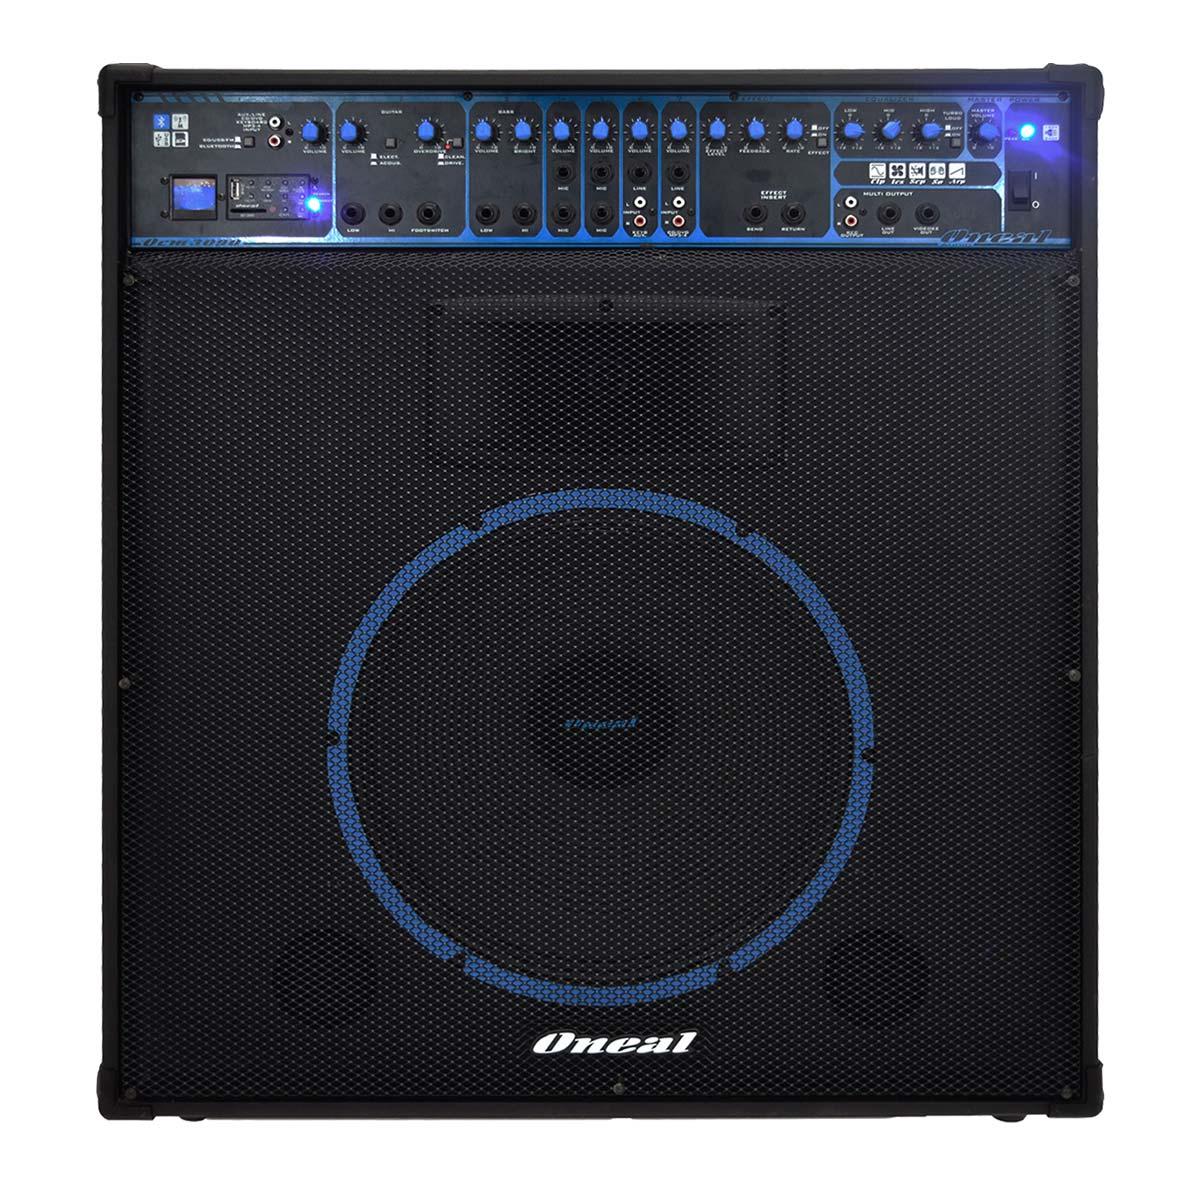 OCM3090 - Cubo Multiuso Ativo 300W c/ Bluetooth e USB OCM 3090 - Oneal